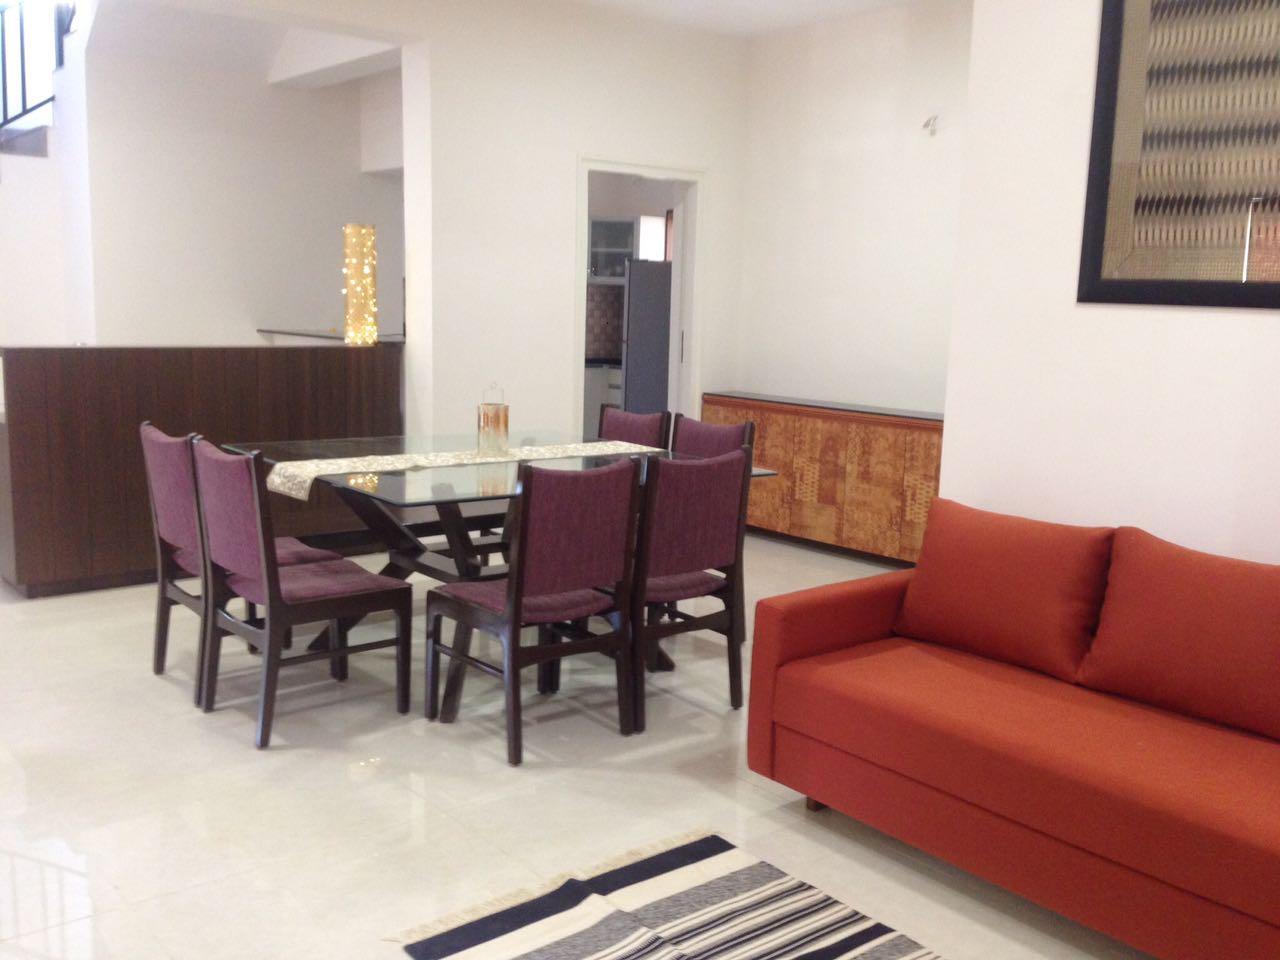 Dining Area With Loveseat Sofa And Mid Century Modern Dining Furniture by Aanoshka Choksi Dining-room Contemporary | Interior Design Photos & Ideas